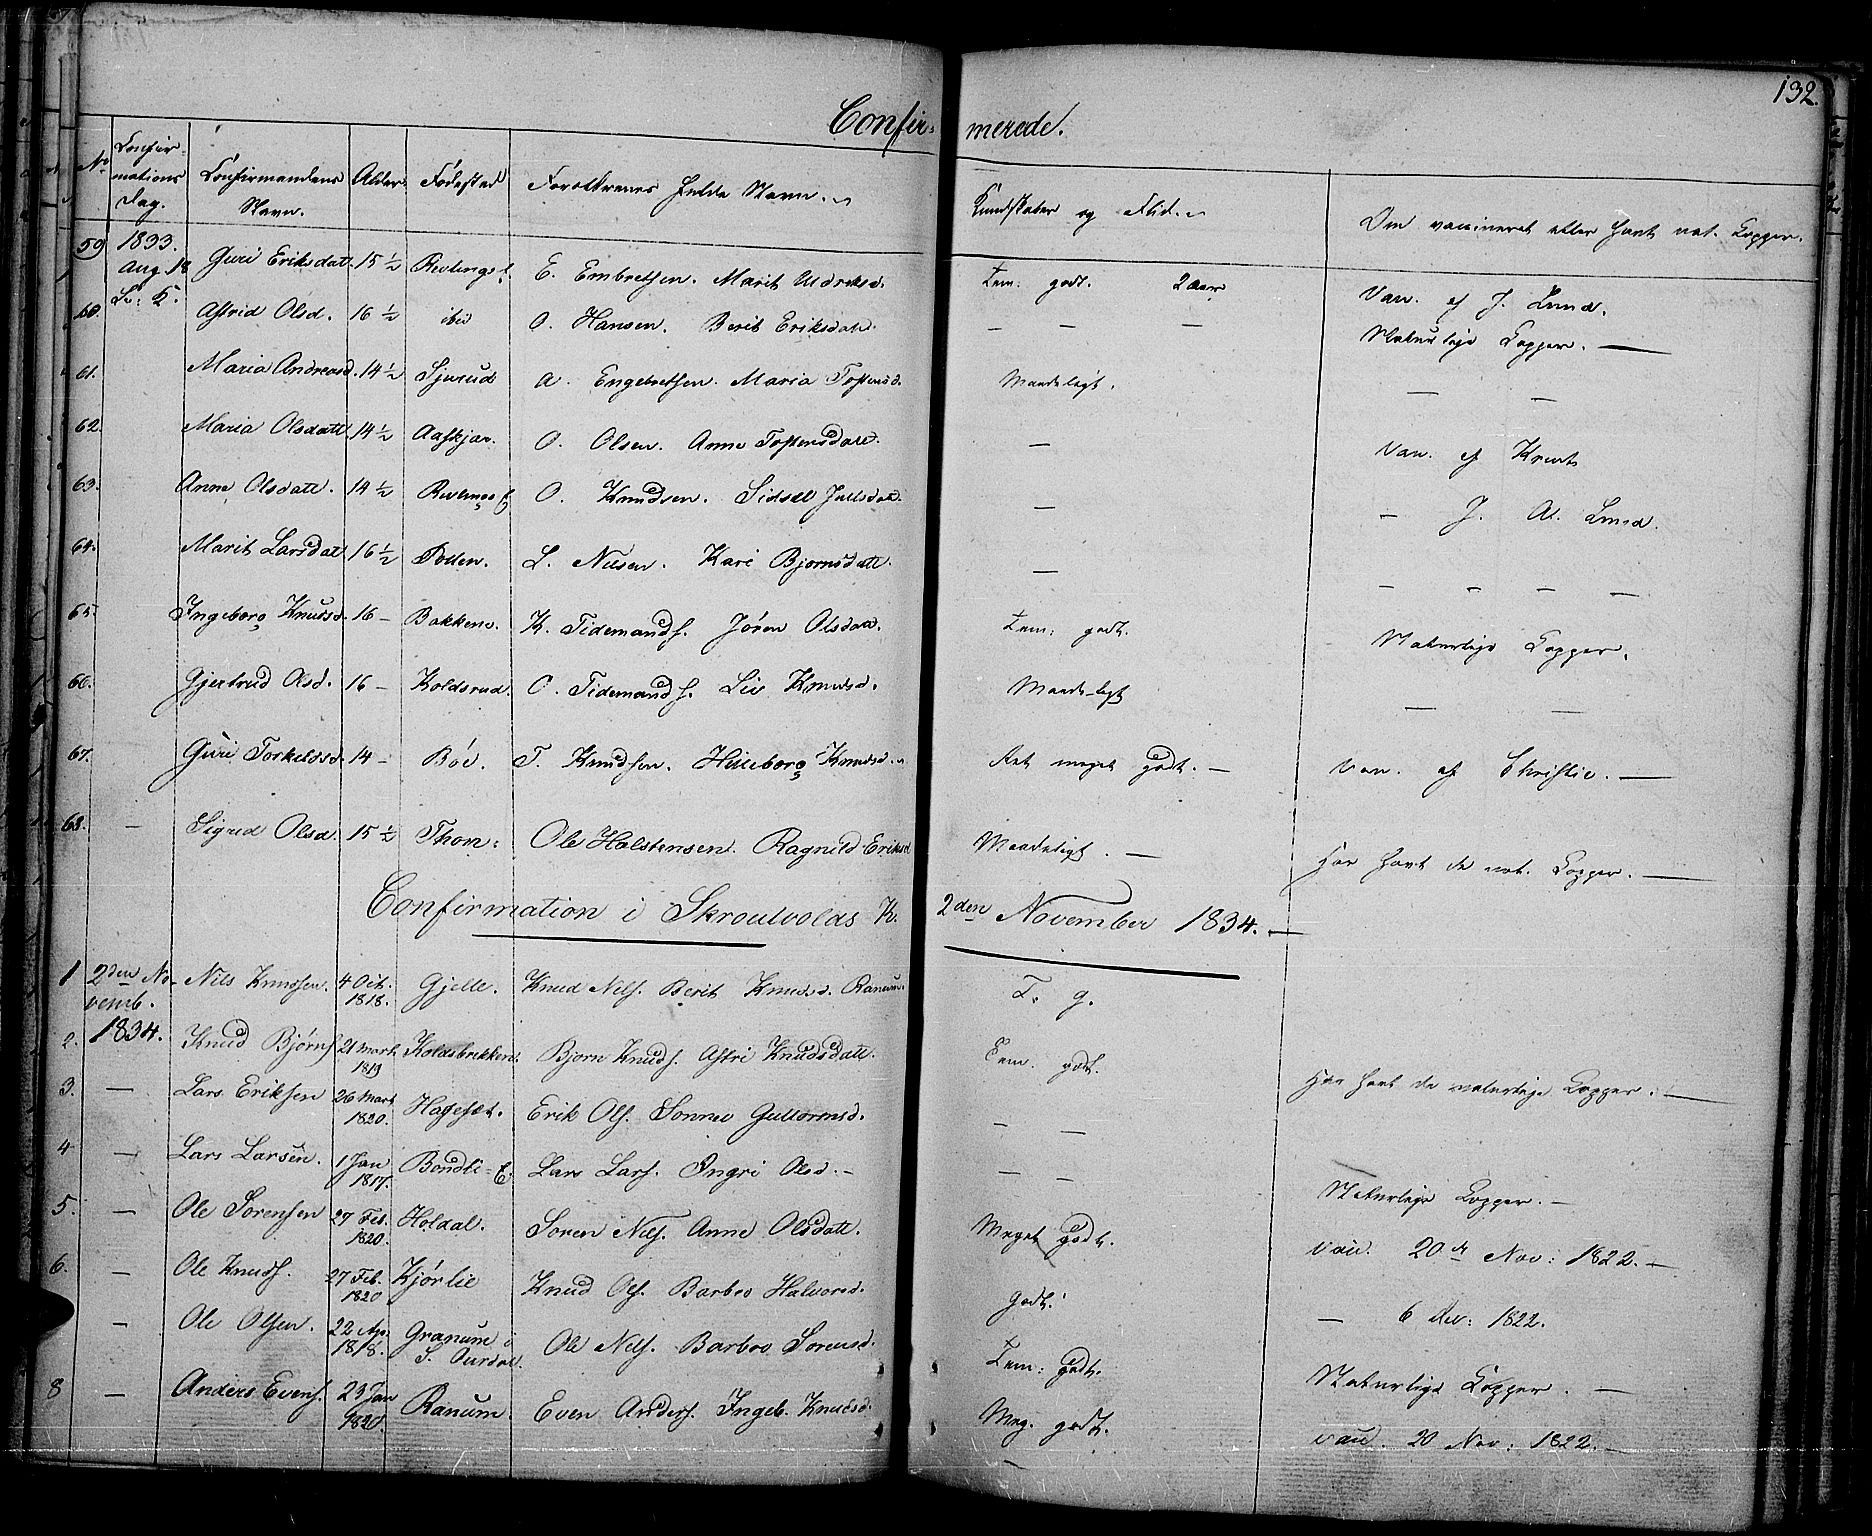 SAH, Nord-Aurdal prestekontor, Ministerialbok nr. 3, 1828-1841, s. 132